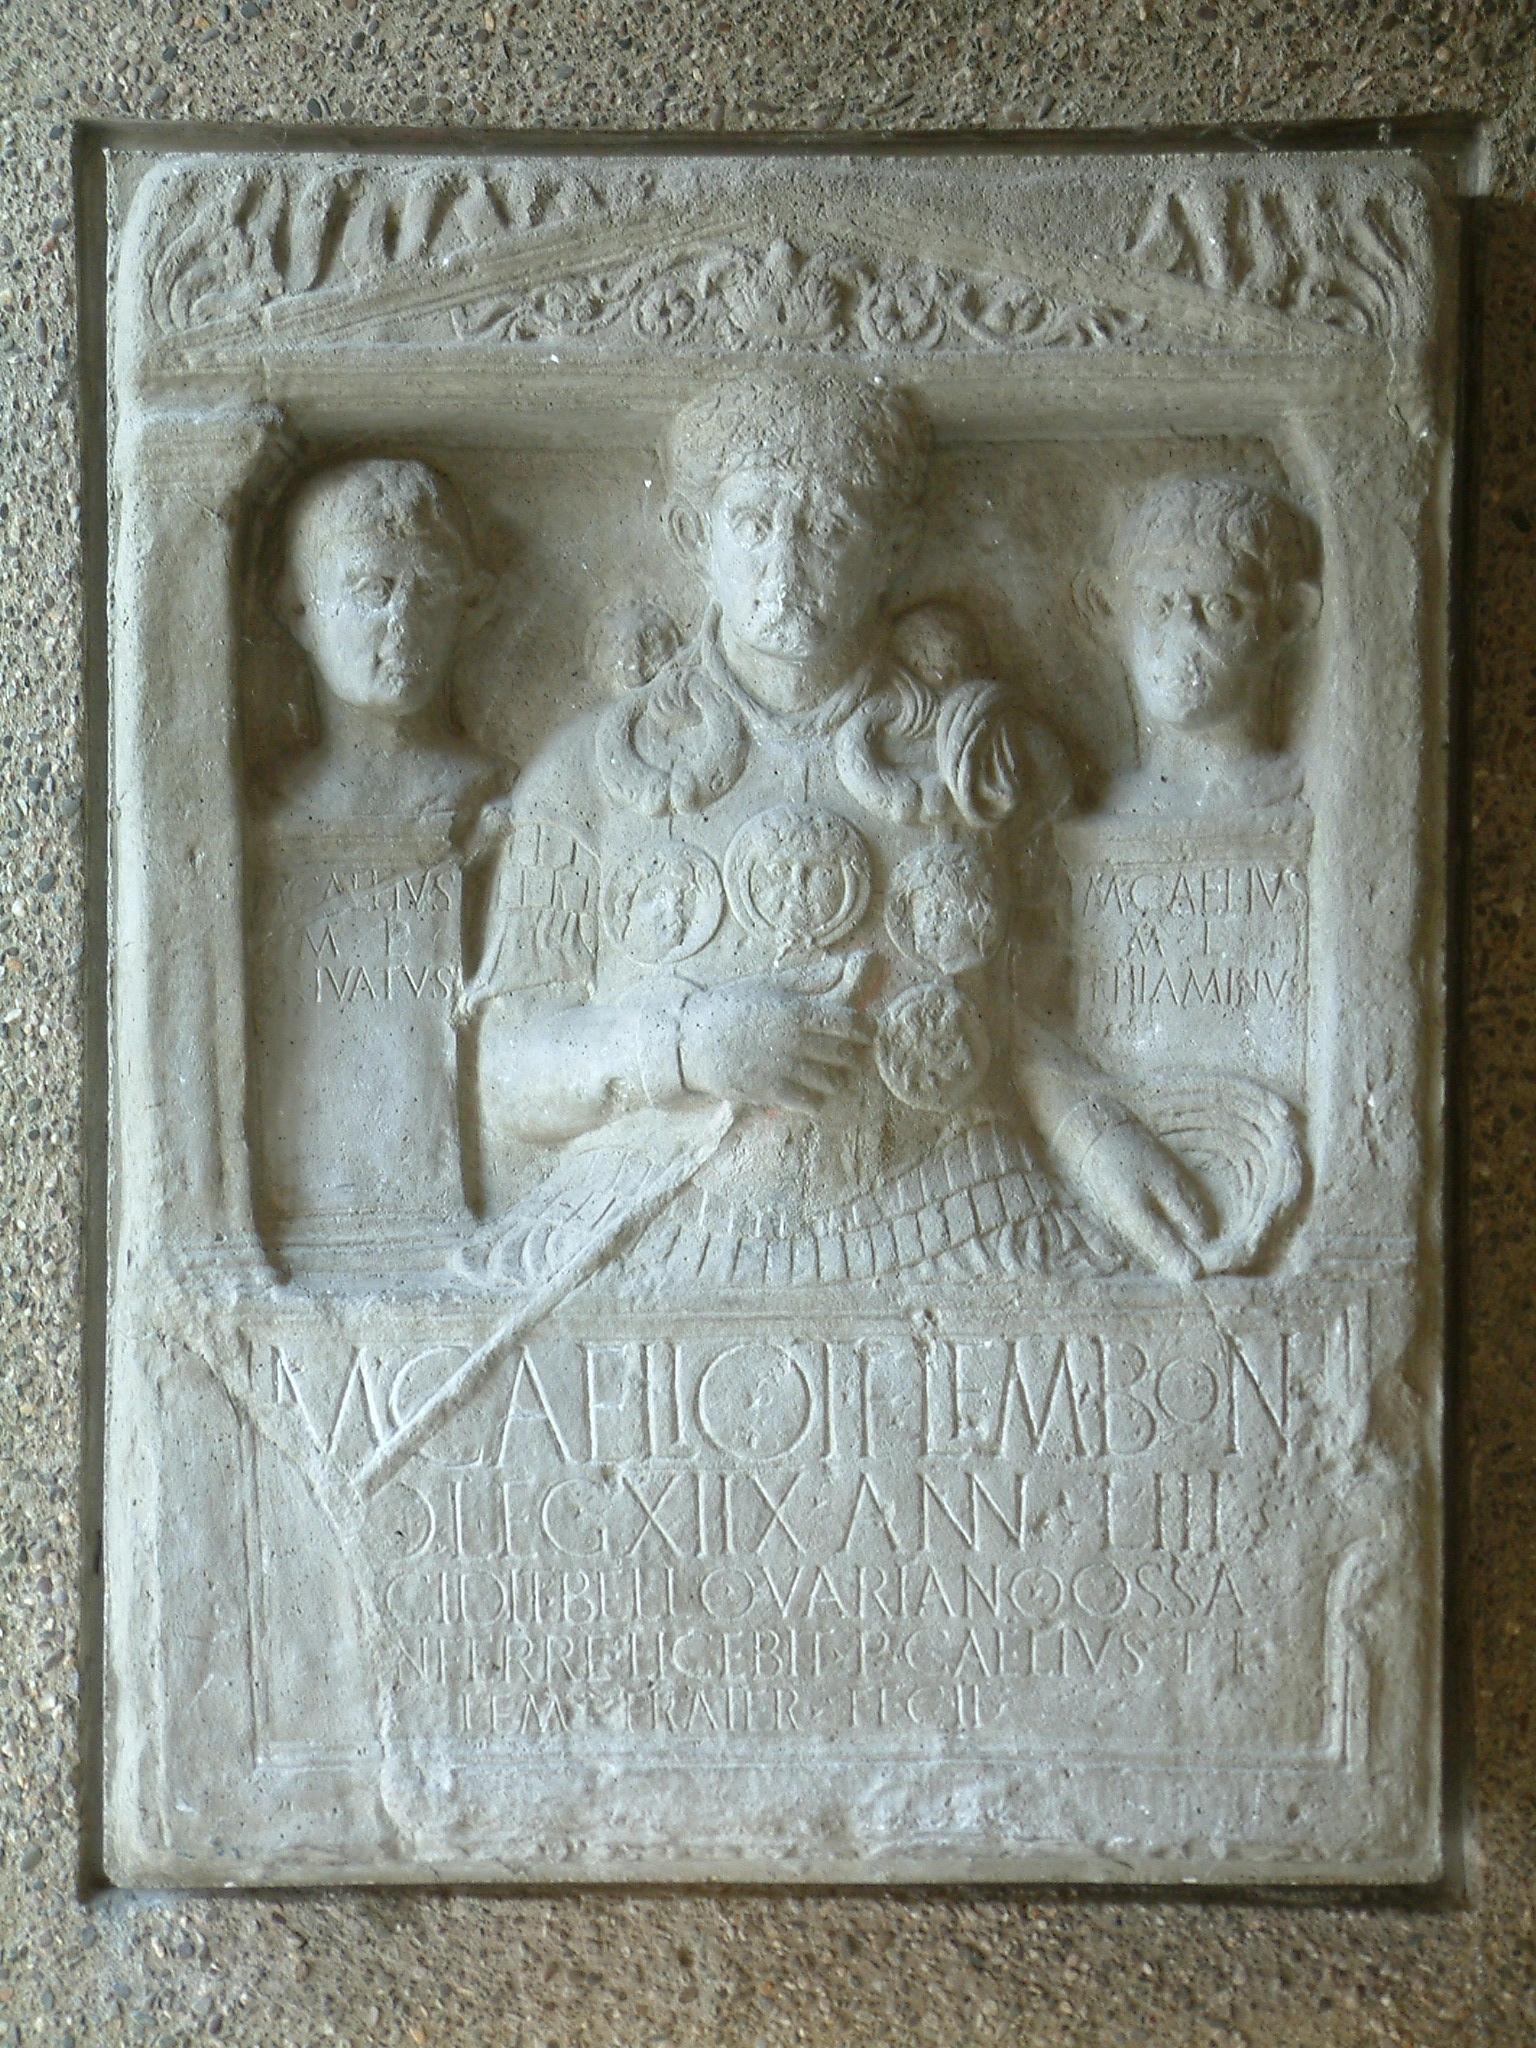 Grabstein des Marcus Caelius